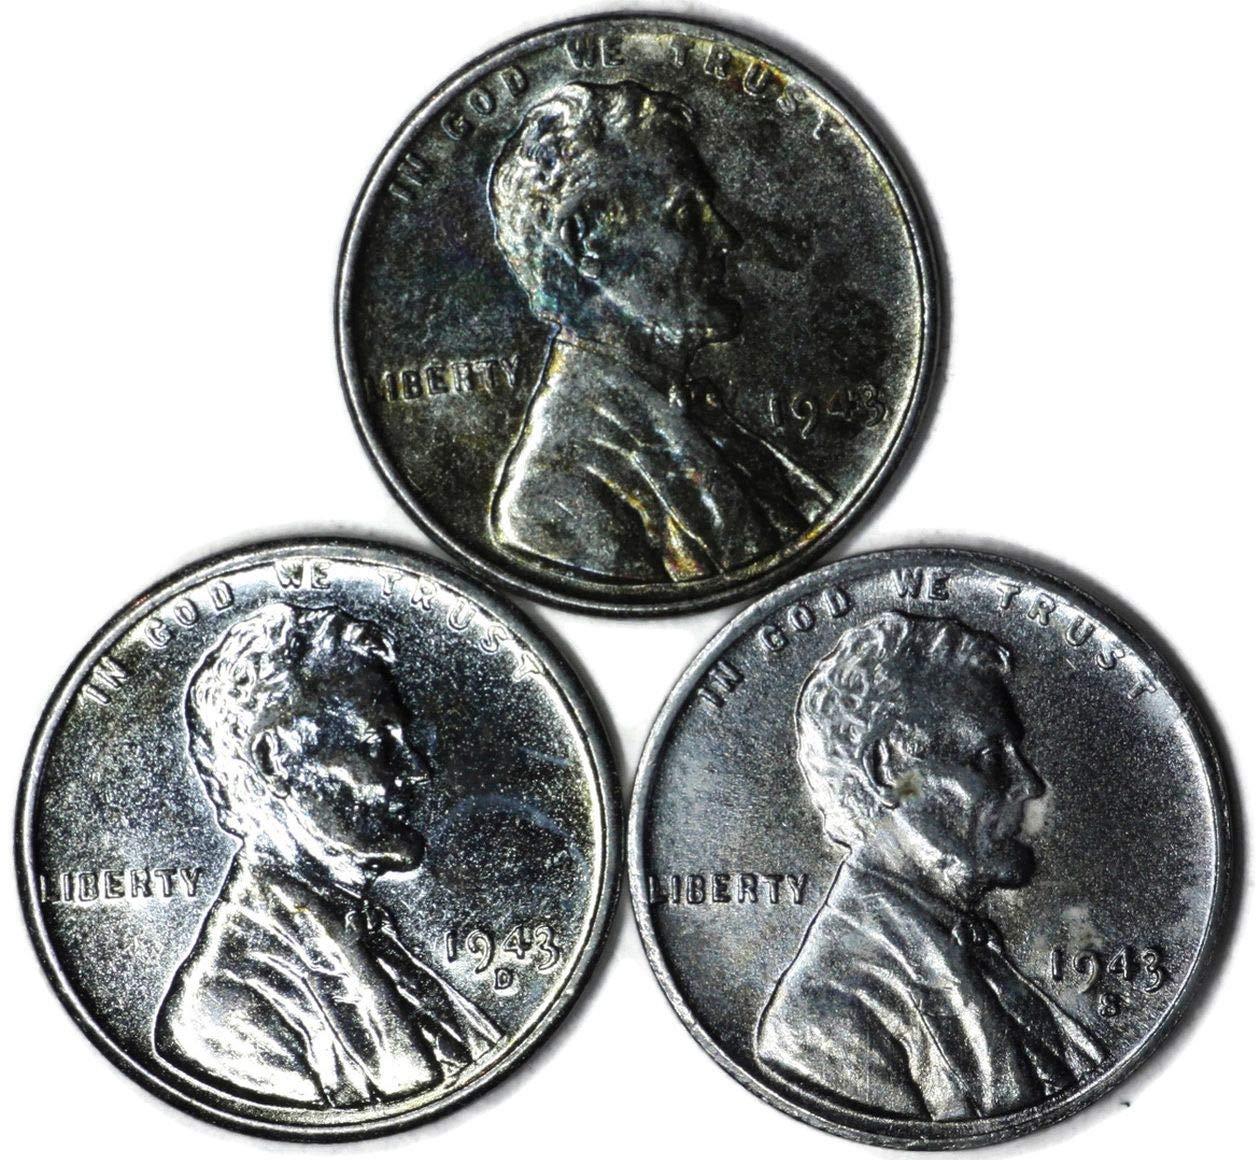 CIRCULATED GRADE GOOD VERY GOOD 3 COIN MERCURY DIME SET 1943 P-D-S